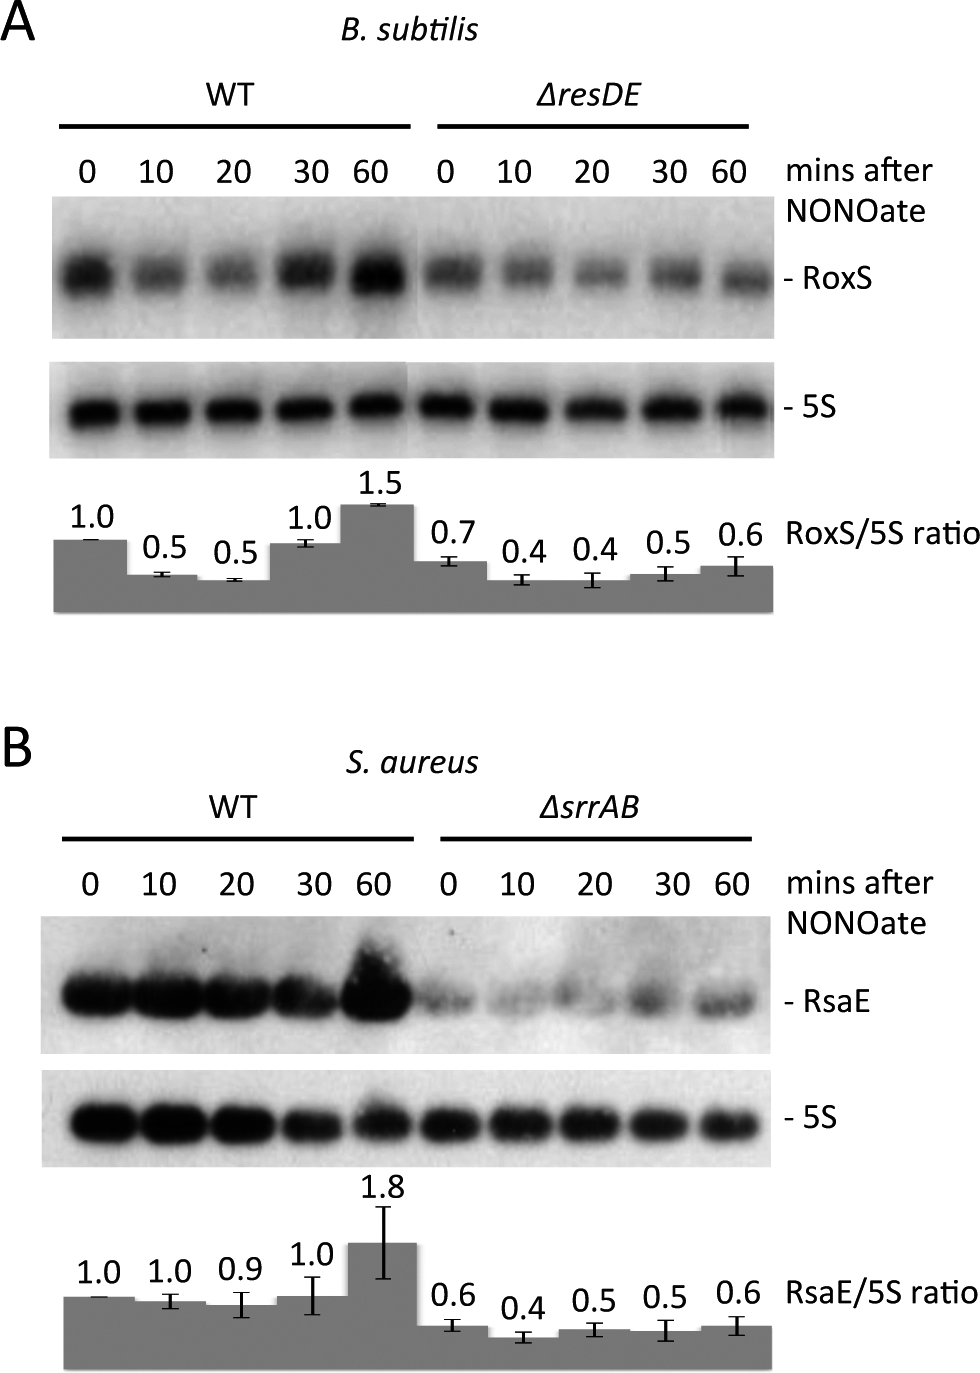 Nitric oxide dependent expression of RoxS in <i>B. subtilis</i> and <i>S. aureus</i>.